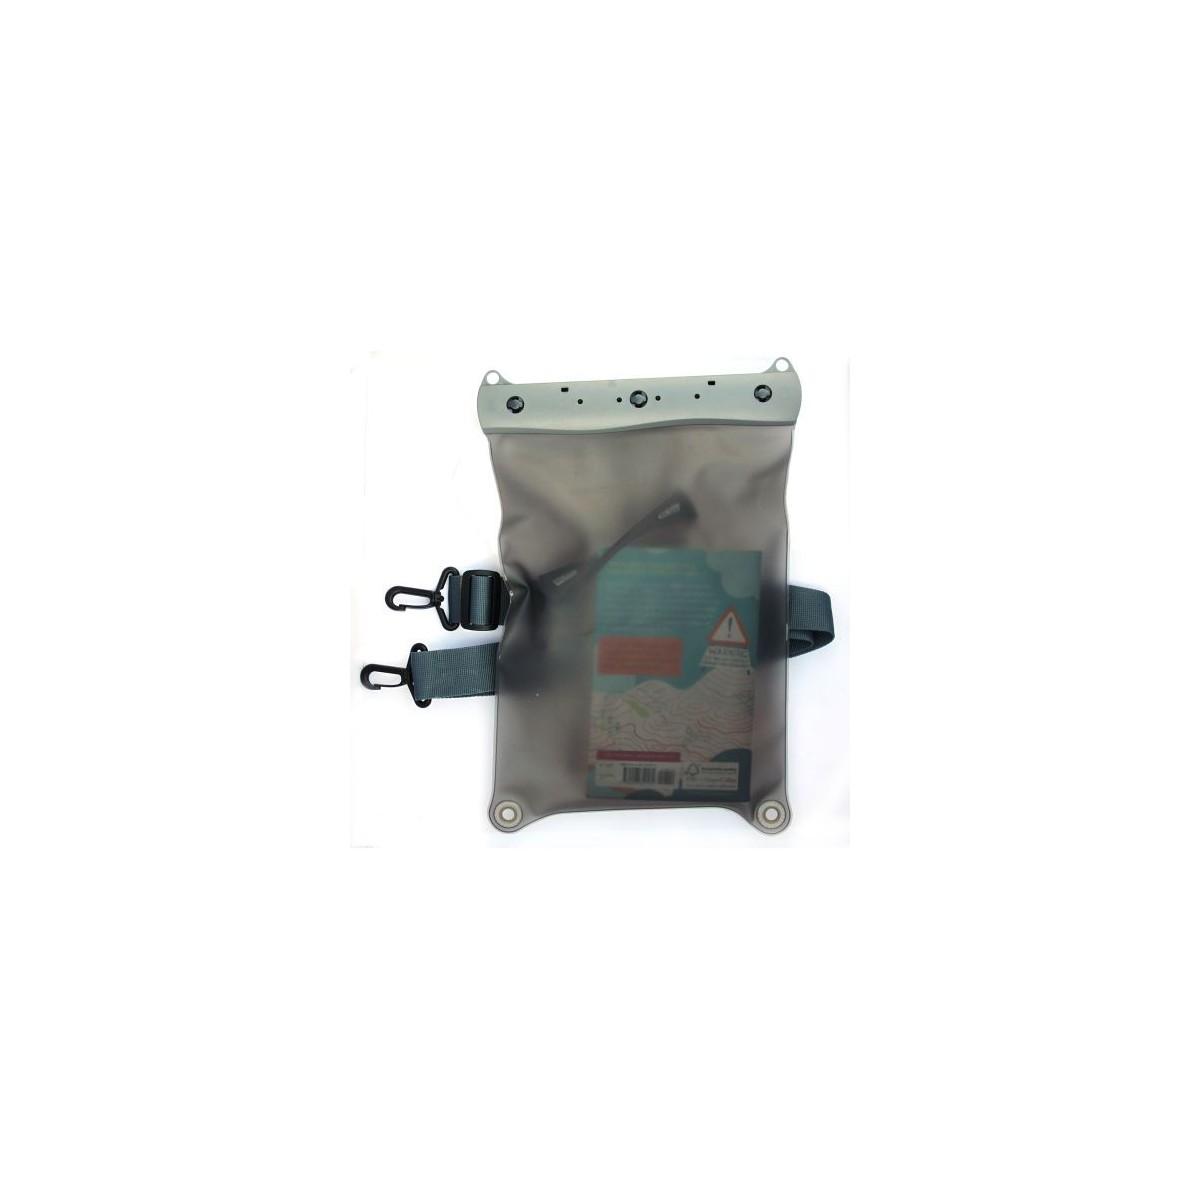 Ūdensdrošie maisi un iepakojumi Aquapac Large Whanganui Electronics Case